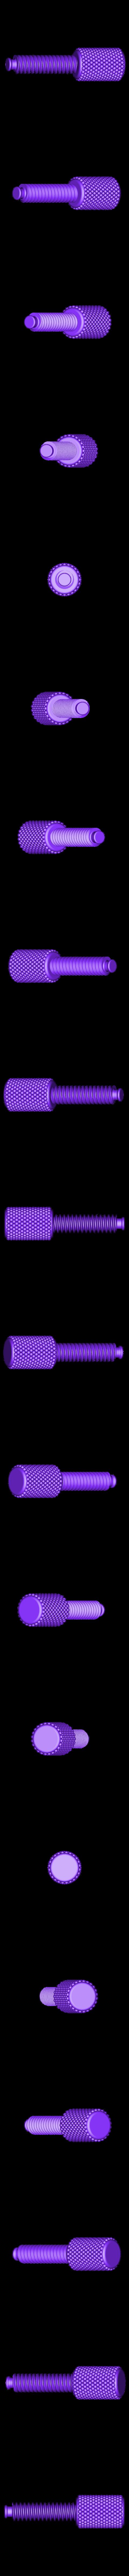 small-nutcracker-handle.stl Download free STL file Nut & walnut cracker [My grandma design] • 3D print design, 3d-dragar